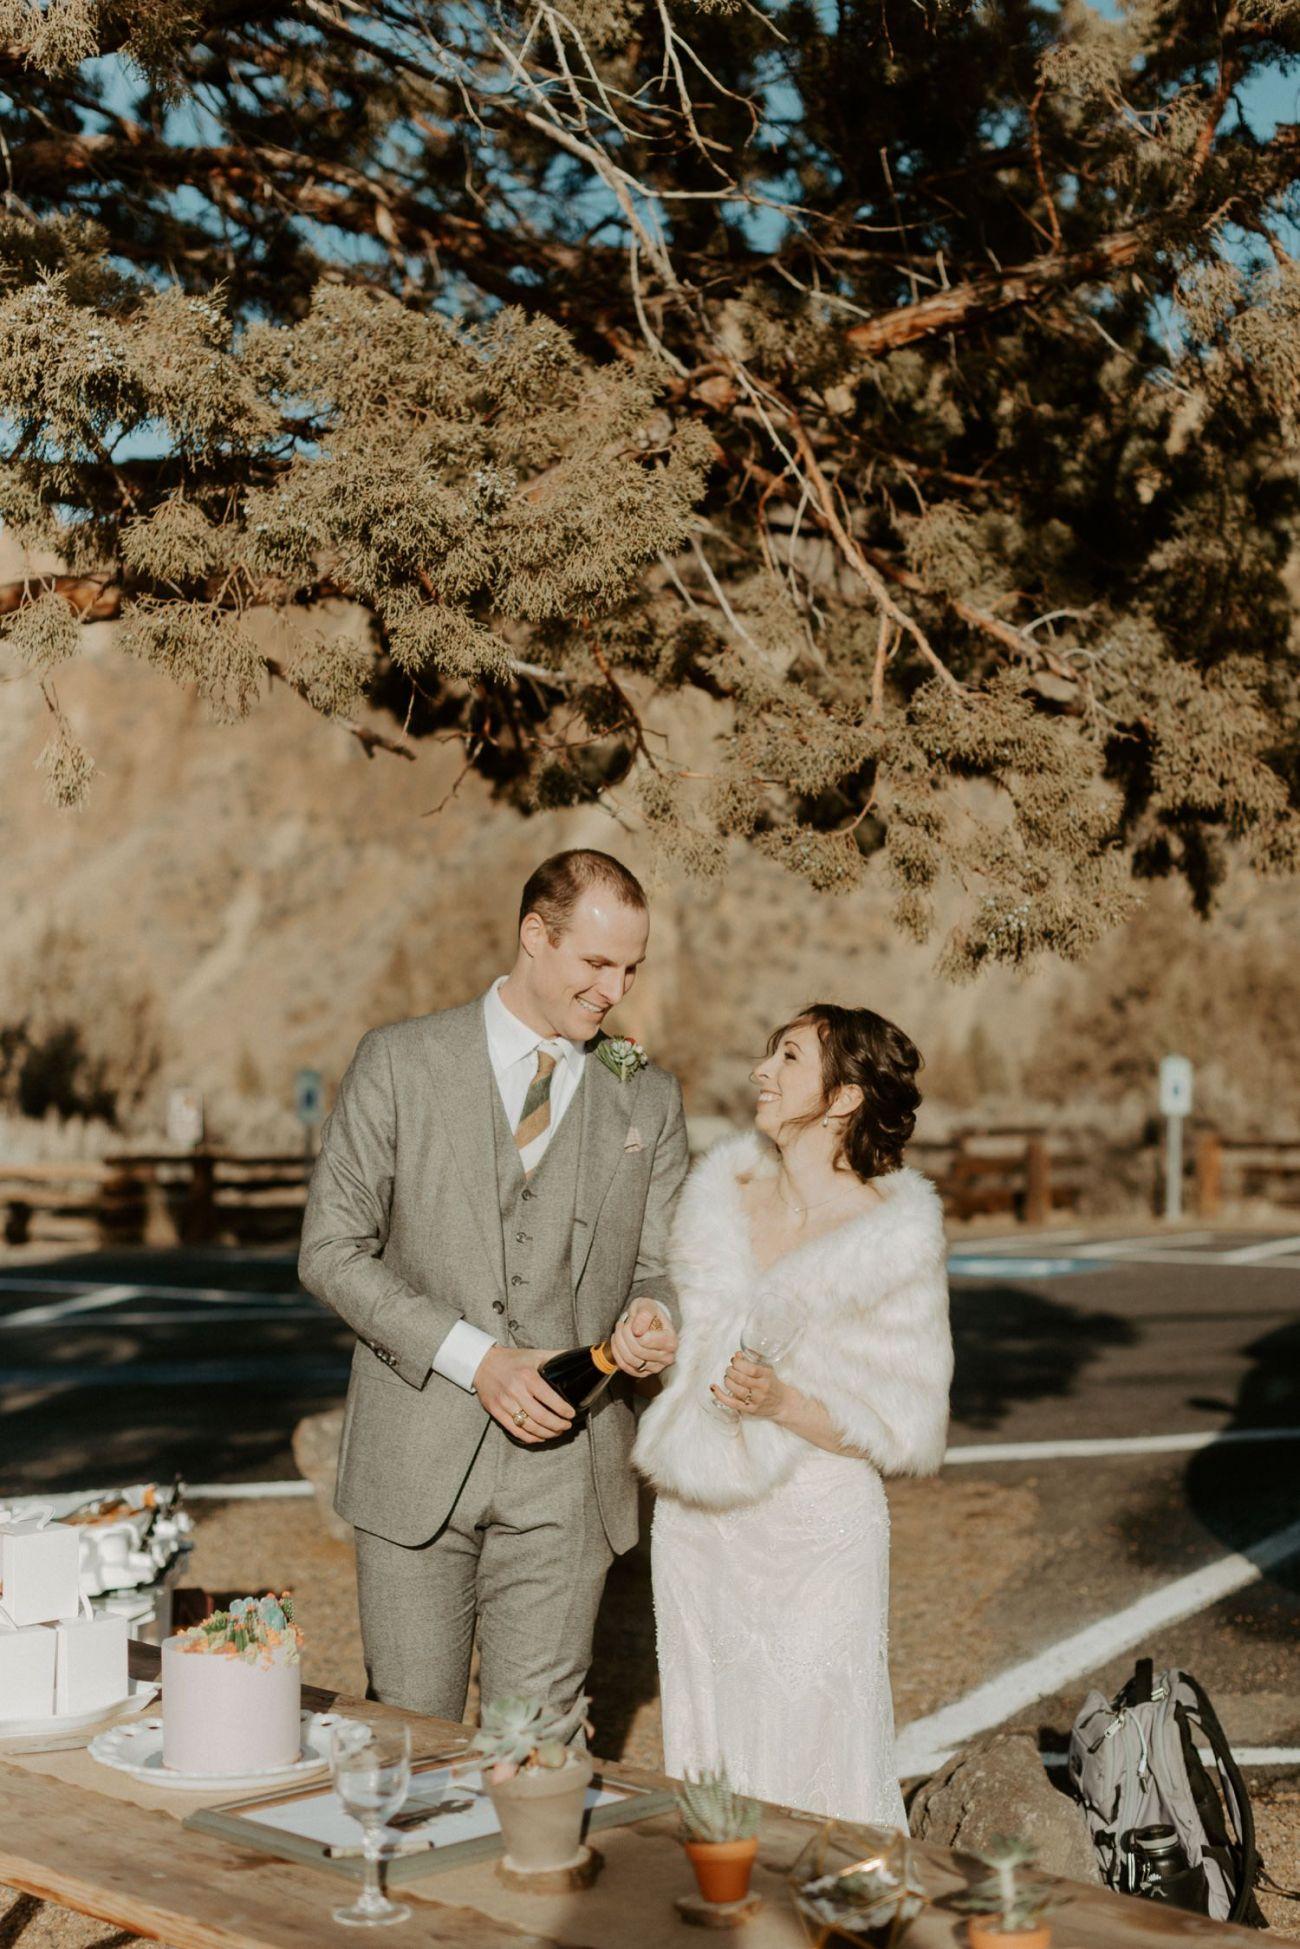 Intimate Wedding In Smith Rock State Park Bend Oregon Wedding Photographer Anais Possamai Photography 021